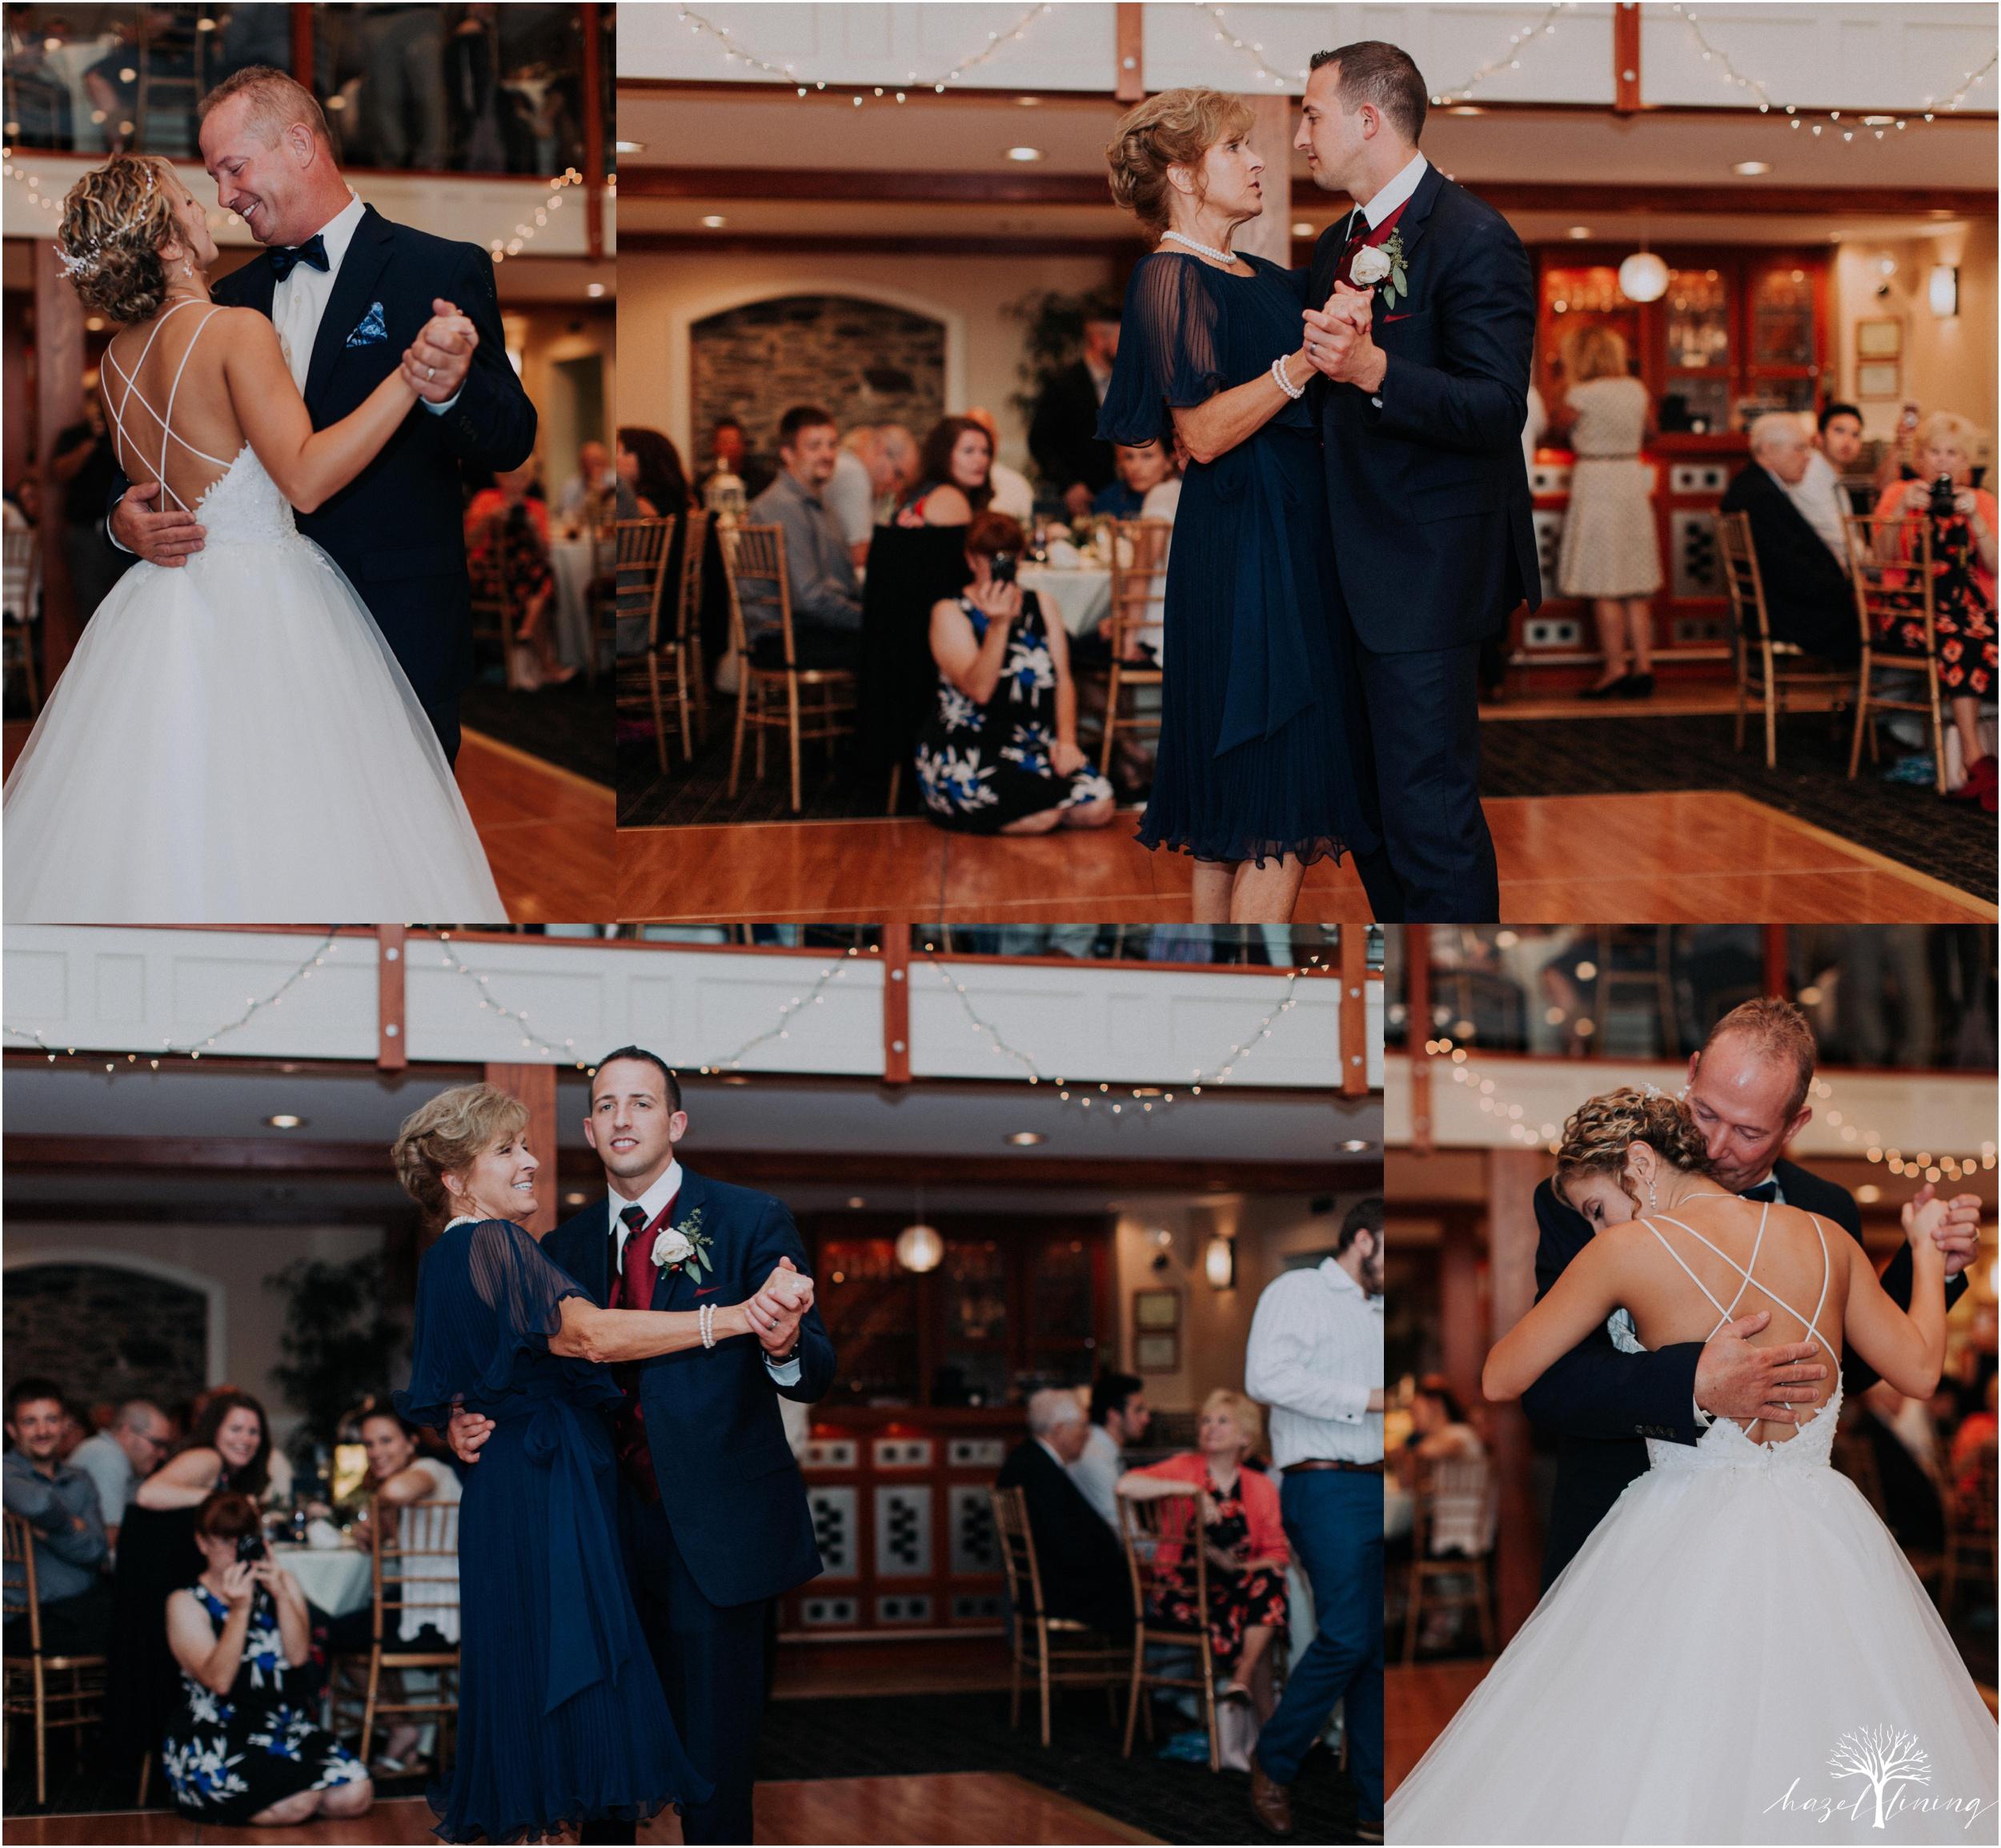 jonathan-weibel-becky-haywood-loft-at-sweetwater-cc-pennsburg-pennsylvania-rainy-day-summer-wedding-hazel-lining-travel-wedding-elopement-photography_0119.jpg